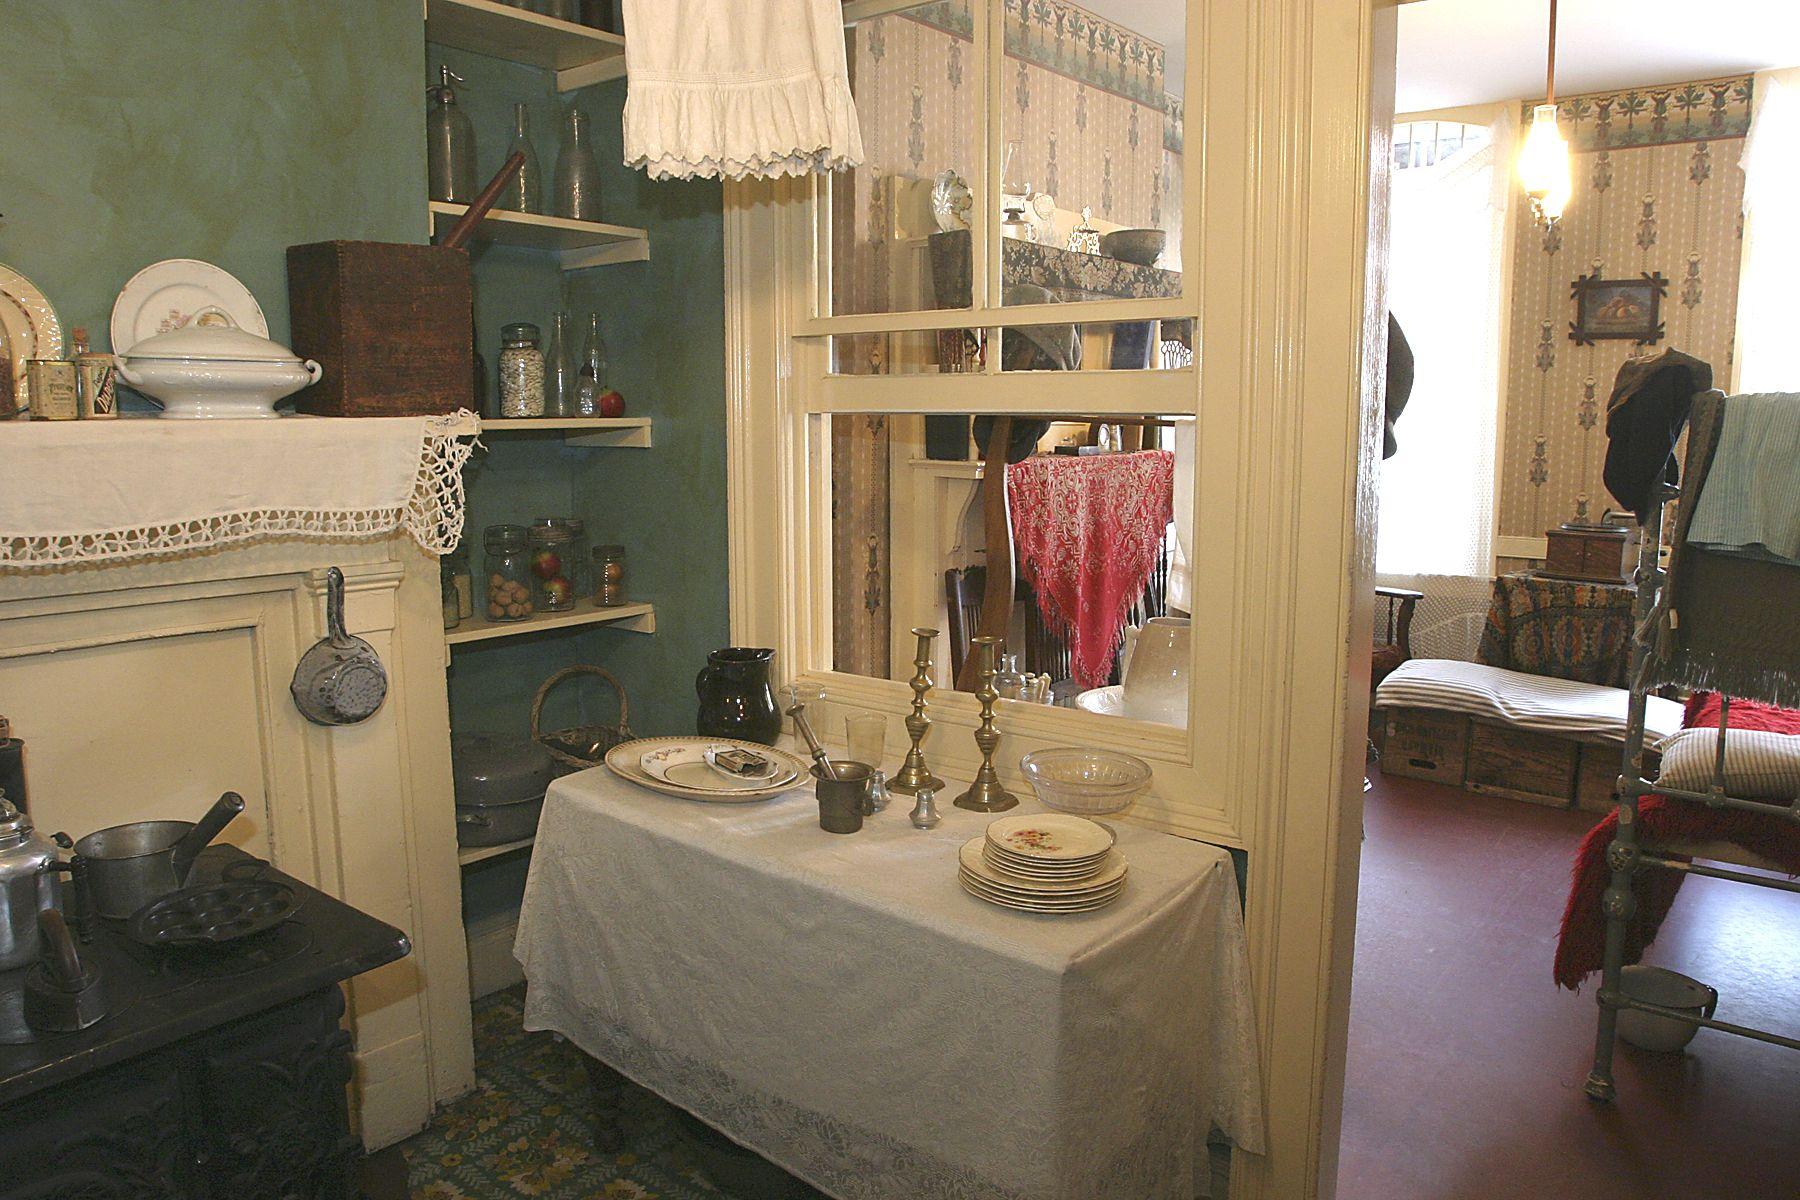 Ruth Mott Victorian Kitchen The Confino Kitchen Inside 97 Orchard Street Pinterest The